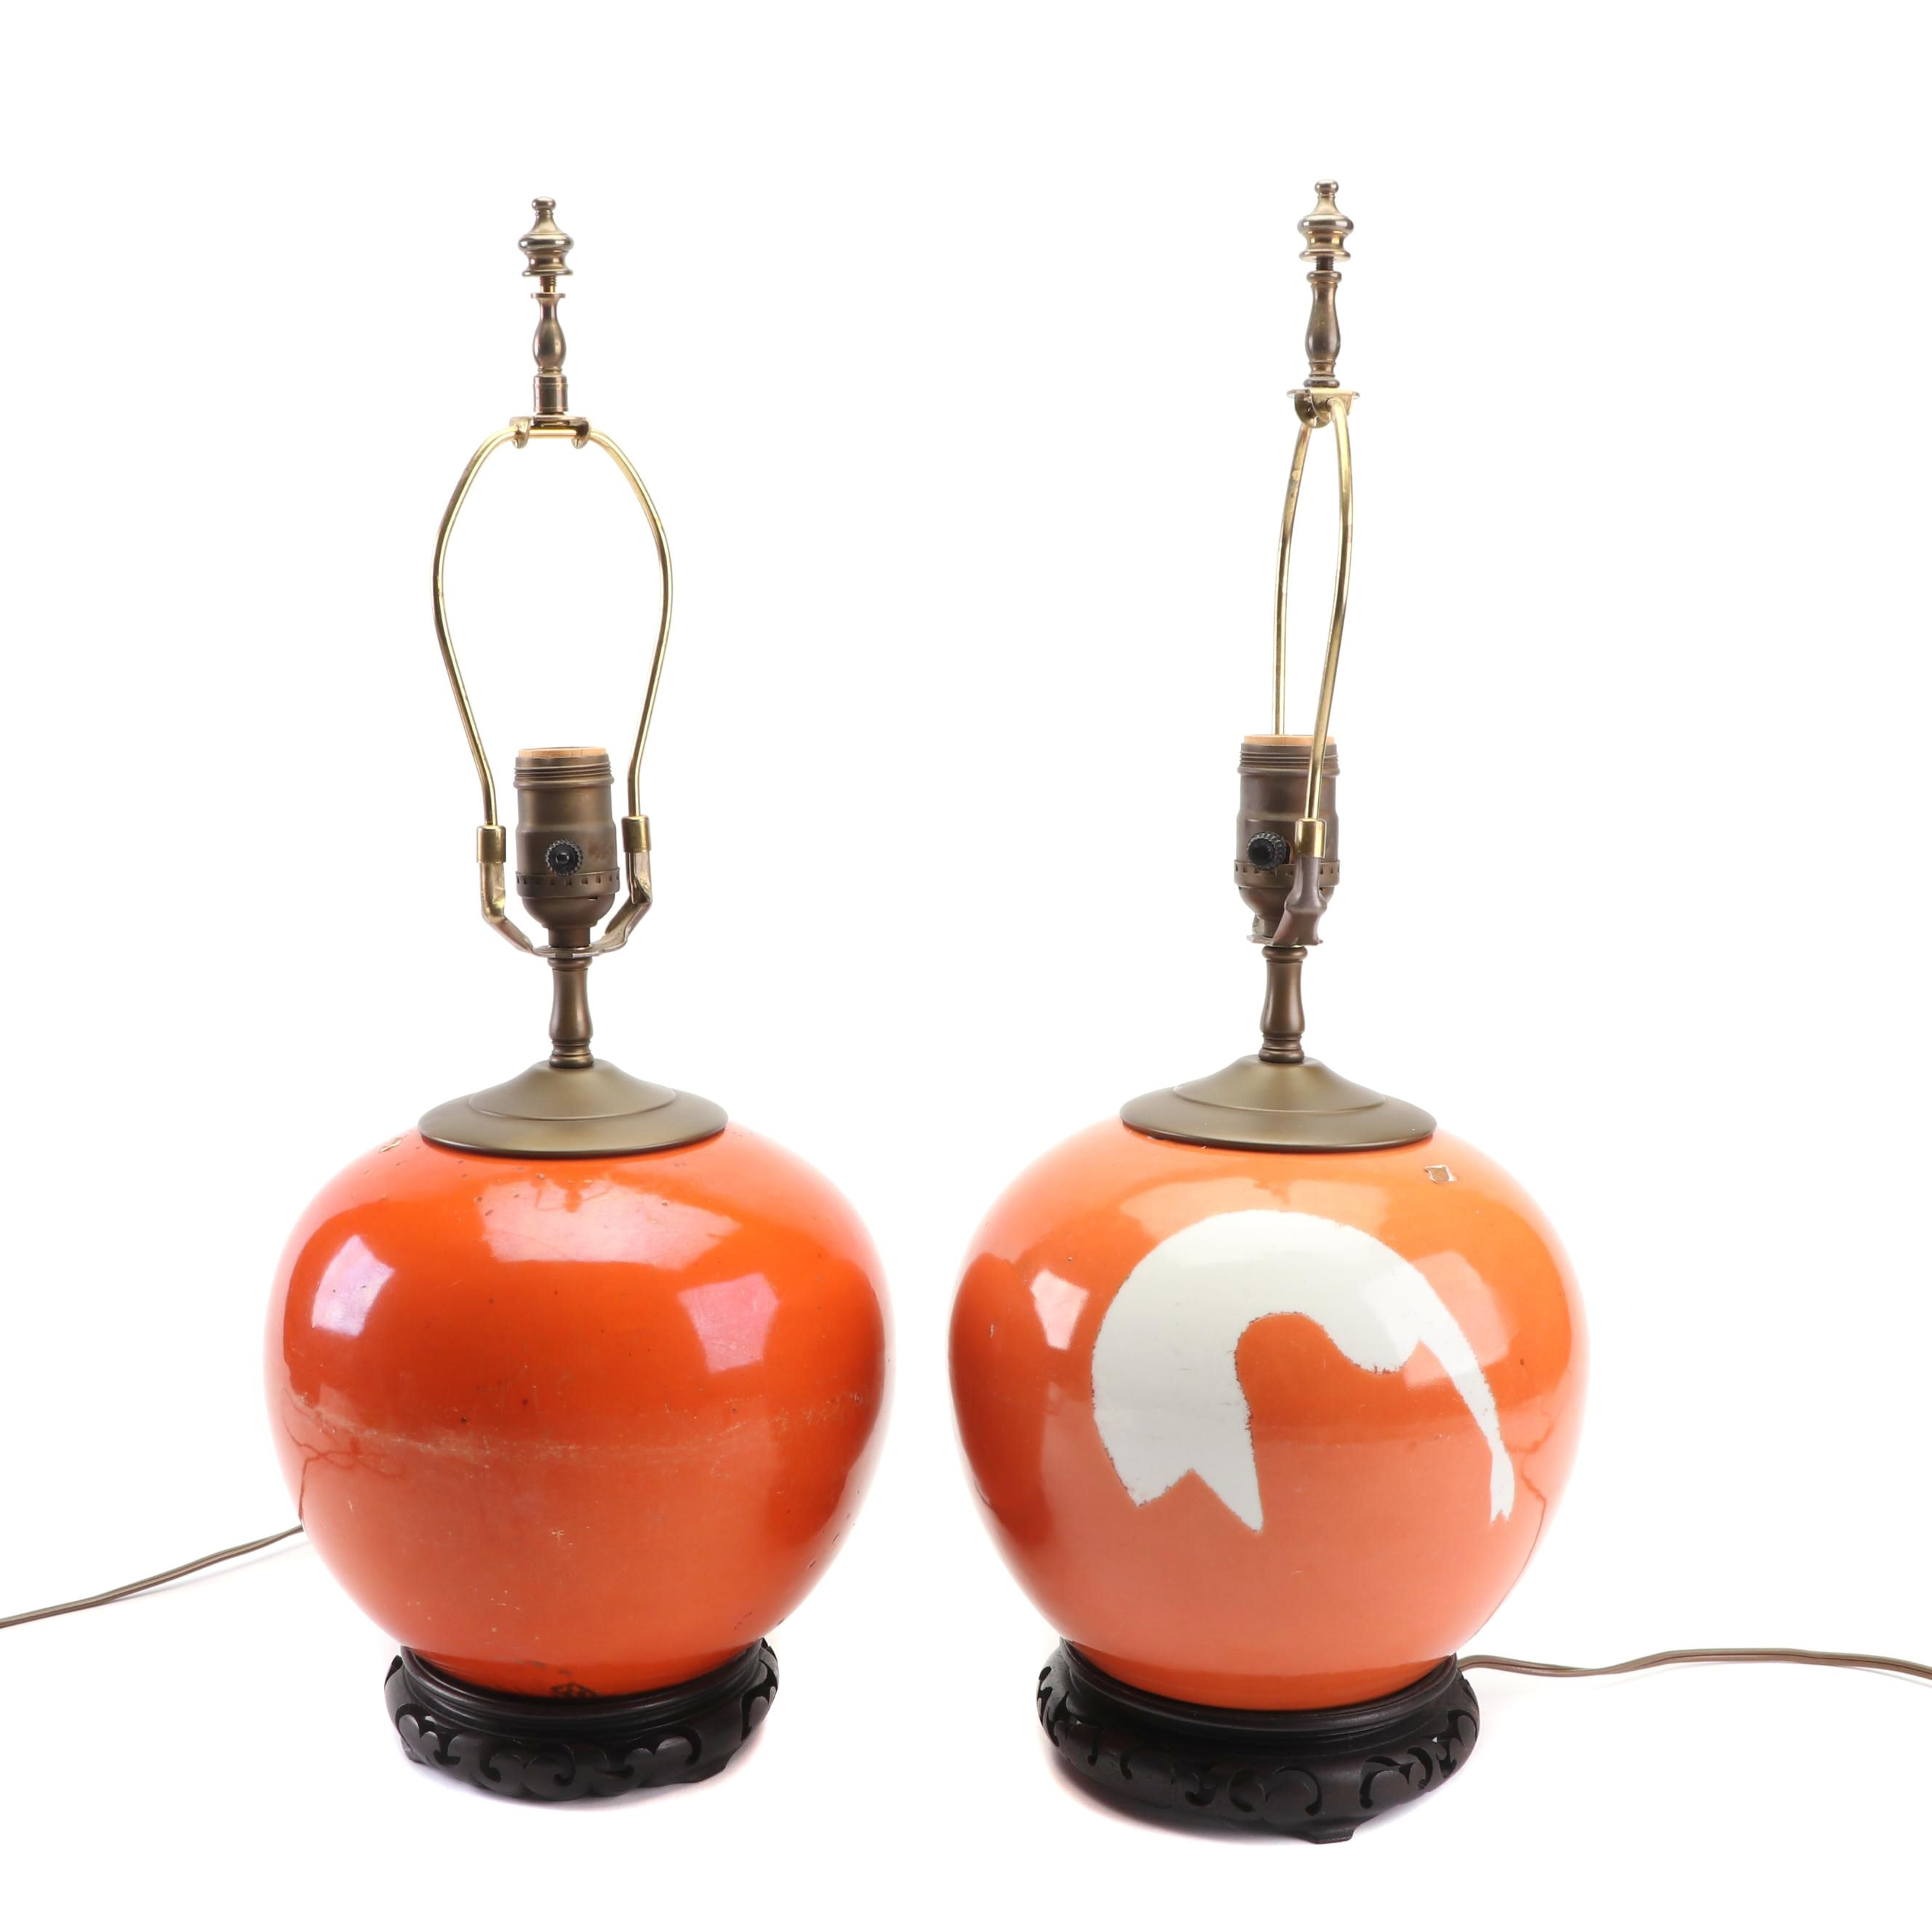 Pair of Asian Orange Ceramic Table Lamps